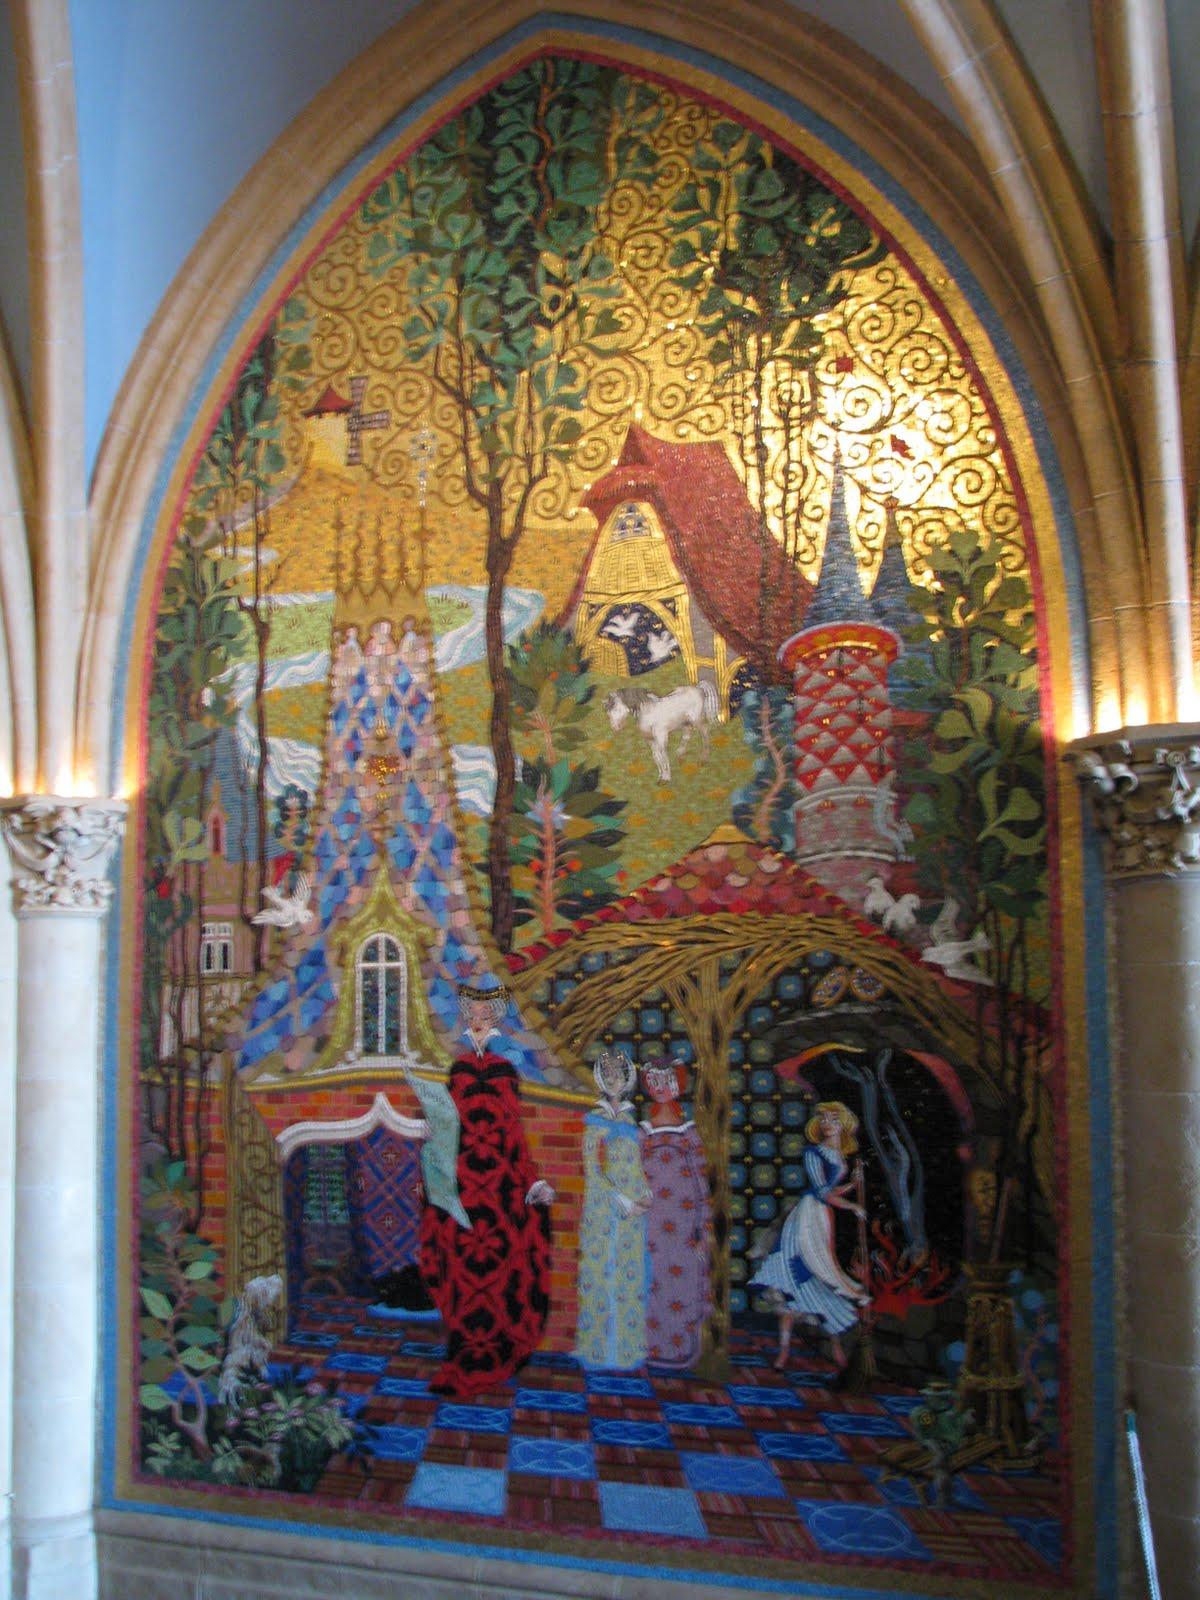 Cinderella castle mosaics in the magic kingdom disney for Disney castle mural